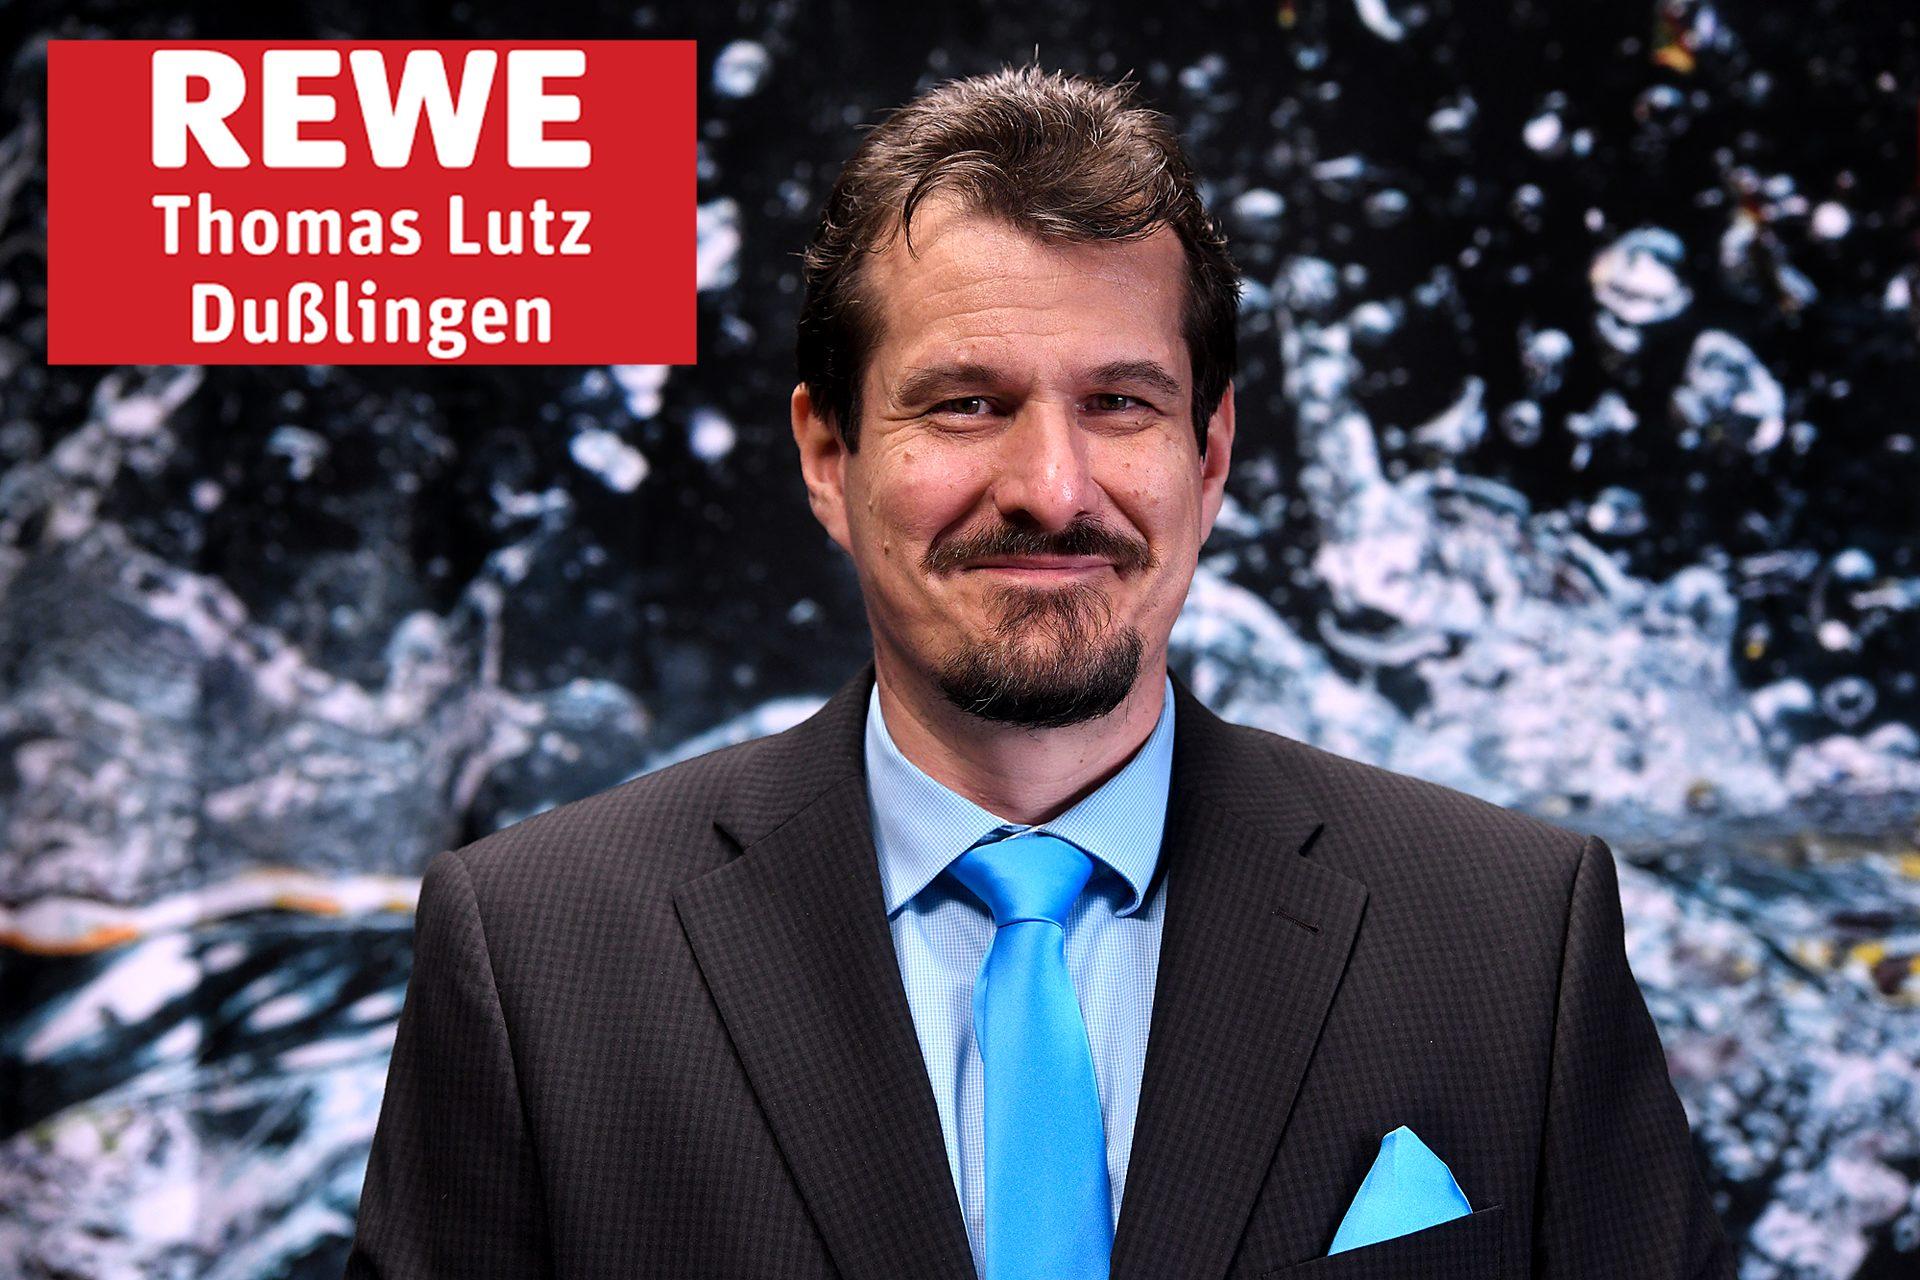 Inhaber Thomas Lutz